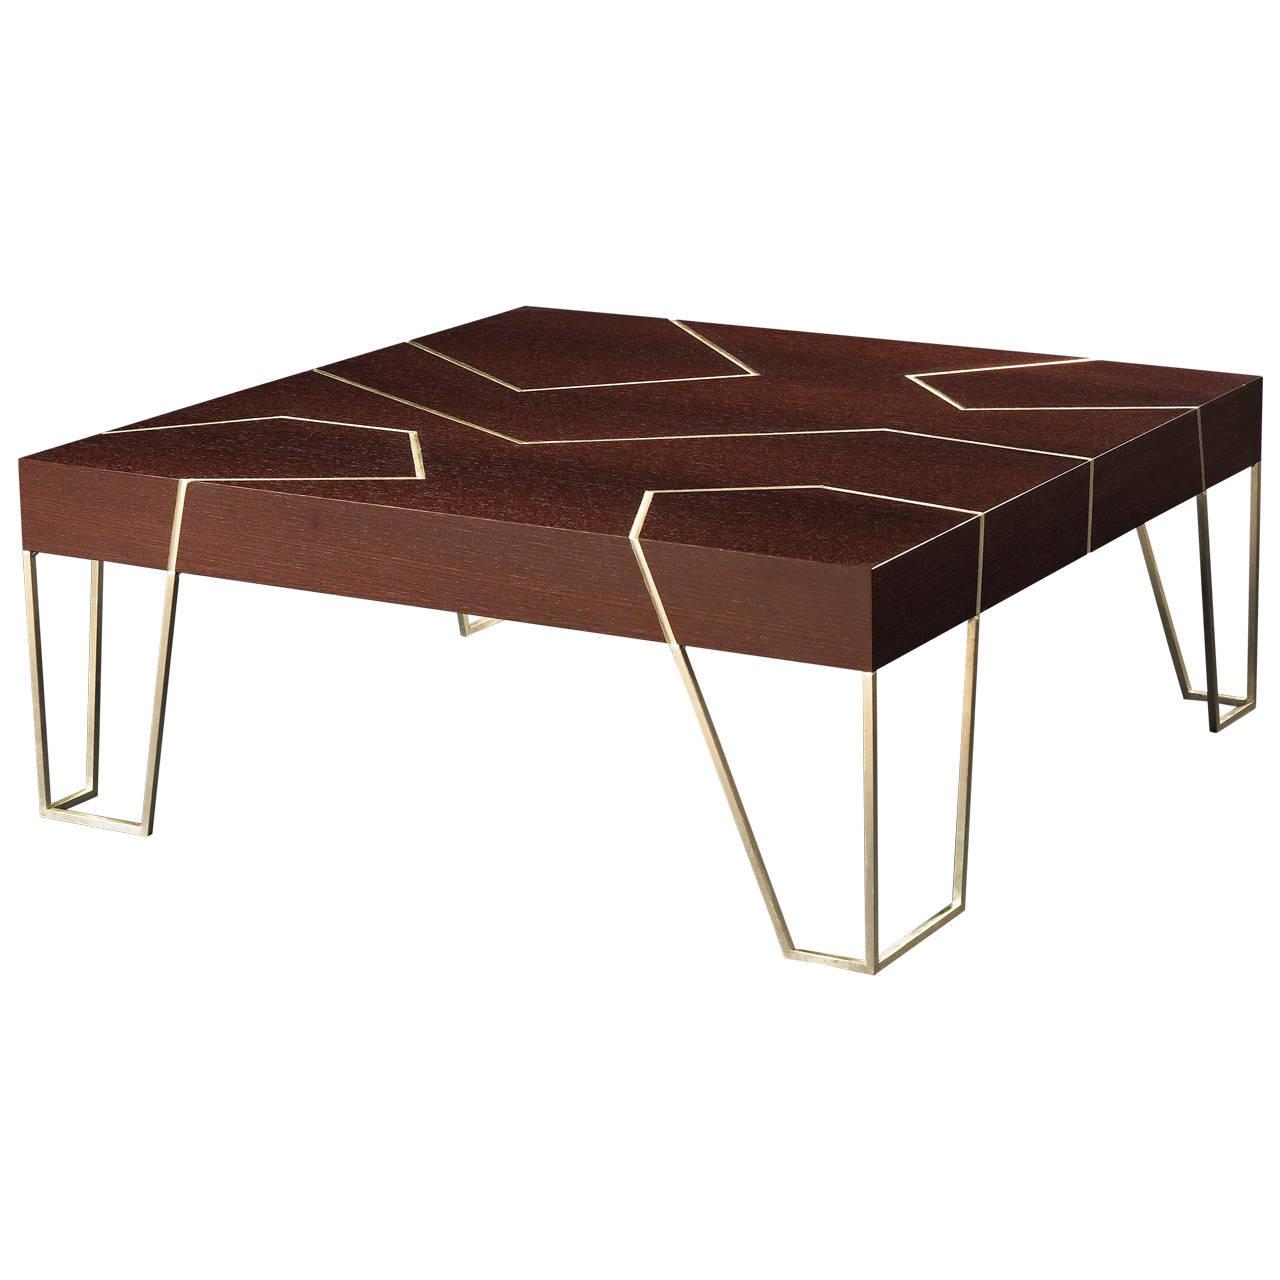 zanzibar by garouste and bonetti in stock cat berro gallery paris pinterest mobilier. Black Bedroom Furniture Sets. Home Design Ideas